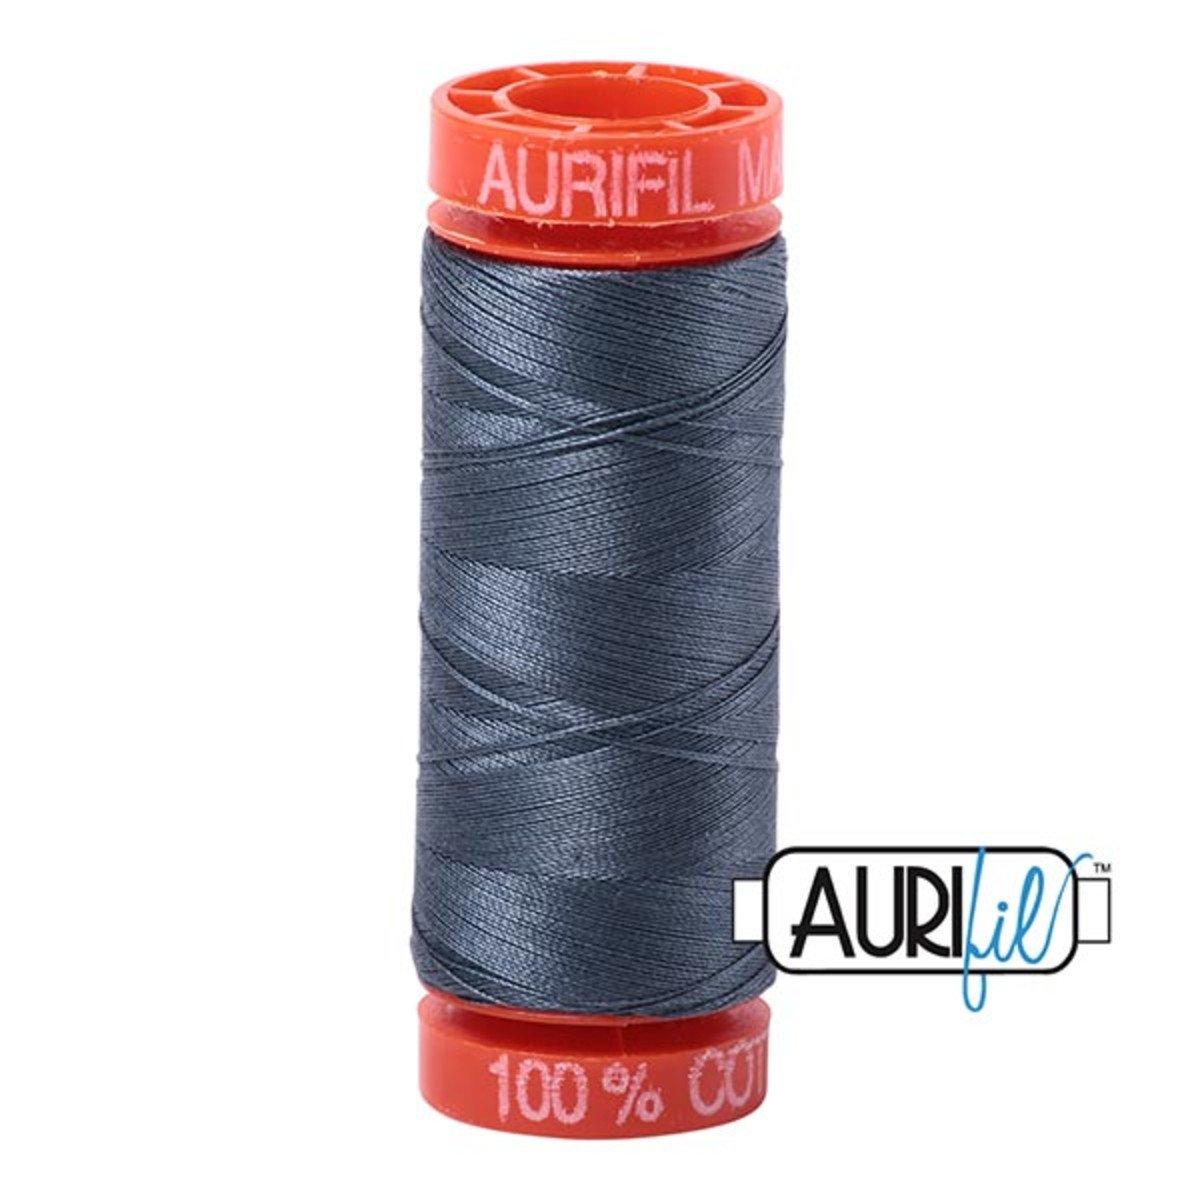 Aurifil Cotton 1158 Med Gray 50wt 220 yds